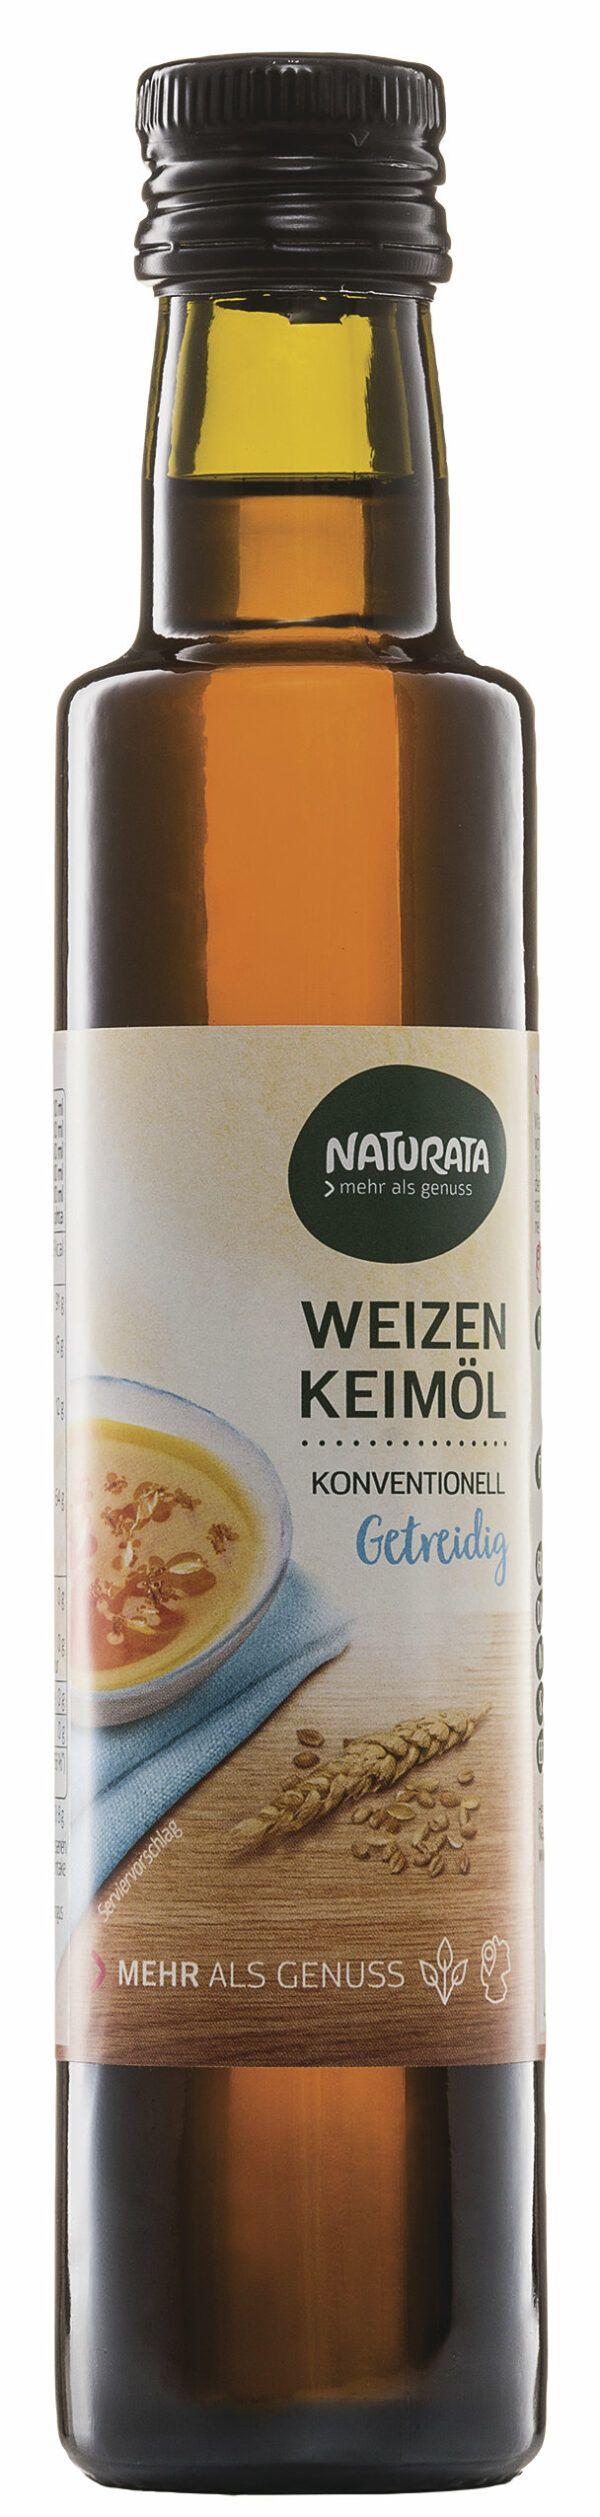 NATURATA Weizenkeimöl 4x250ml